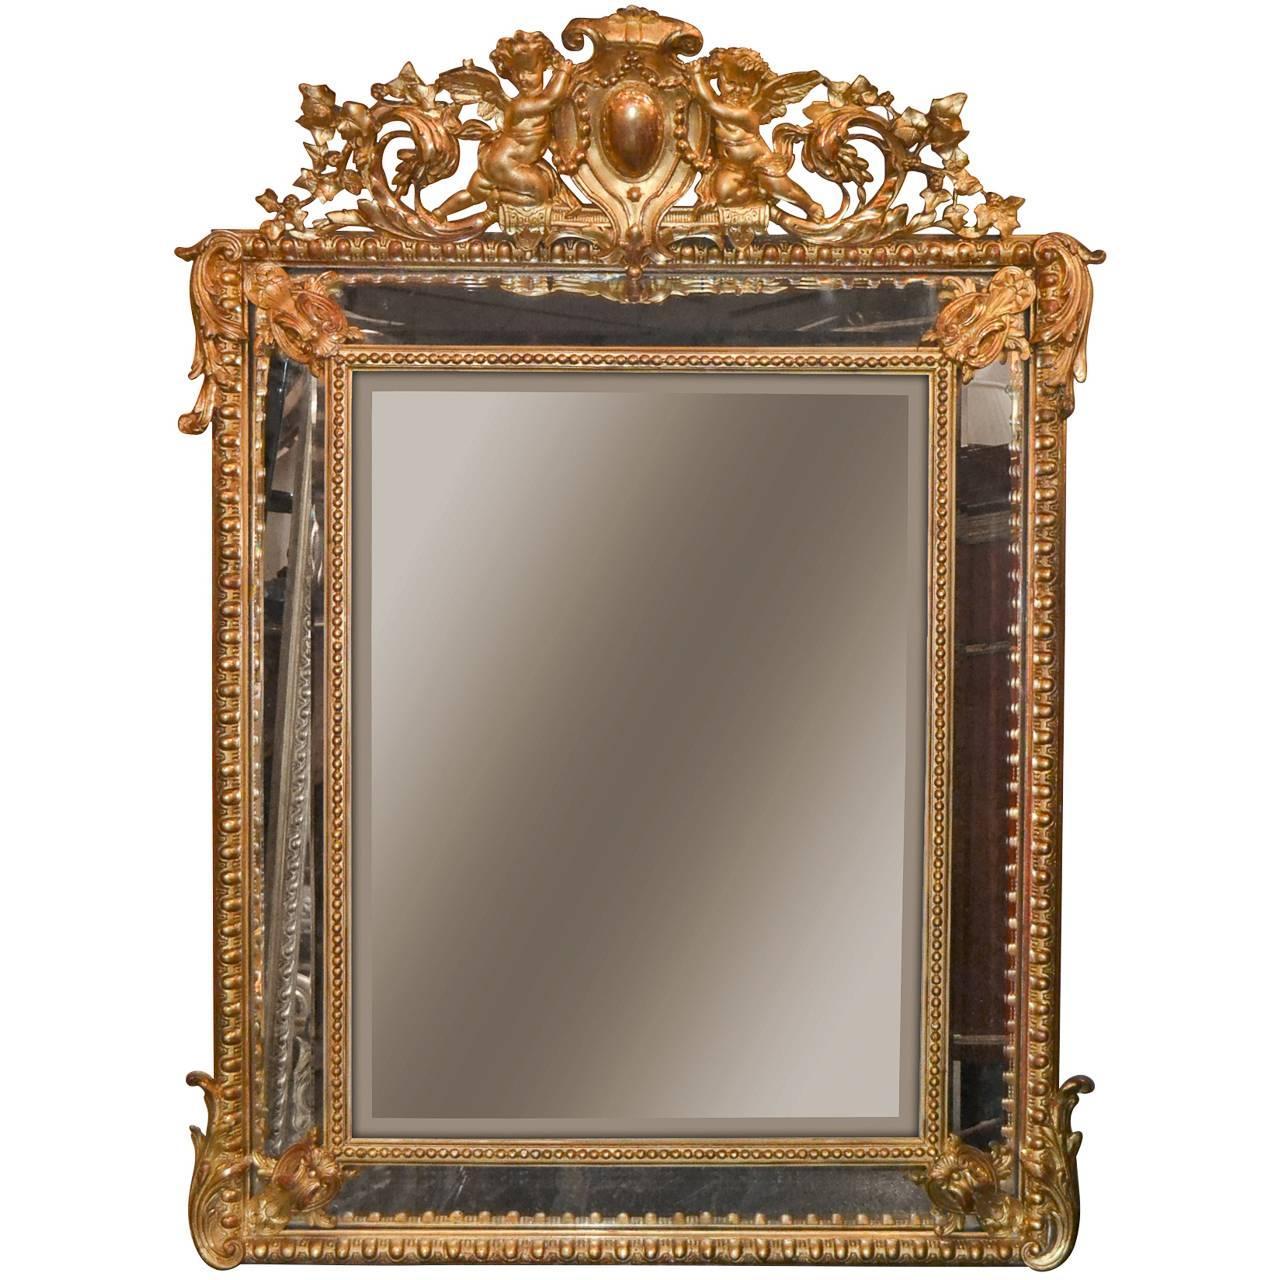 19th Century, French, Louis XV Cushion Mirror